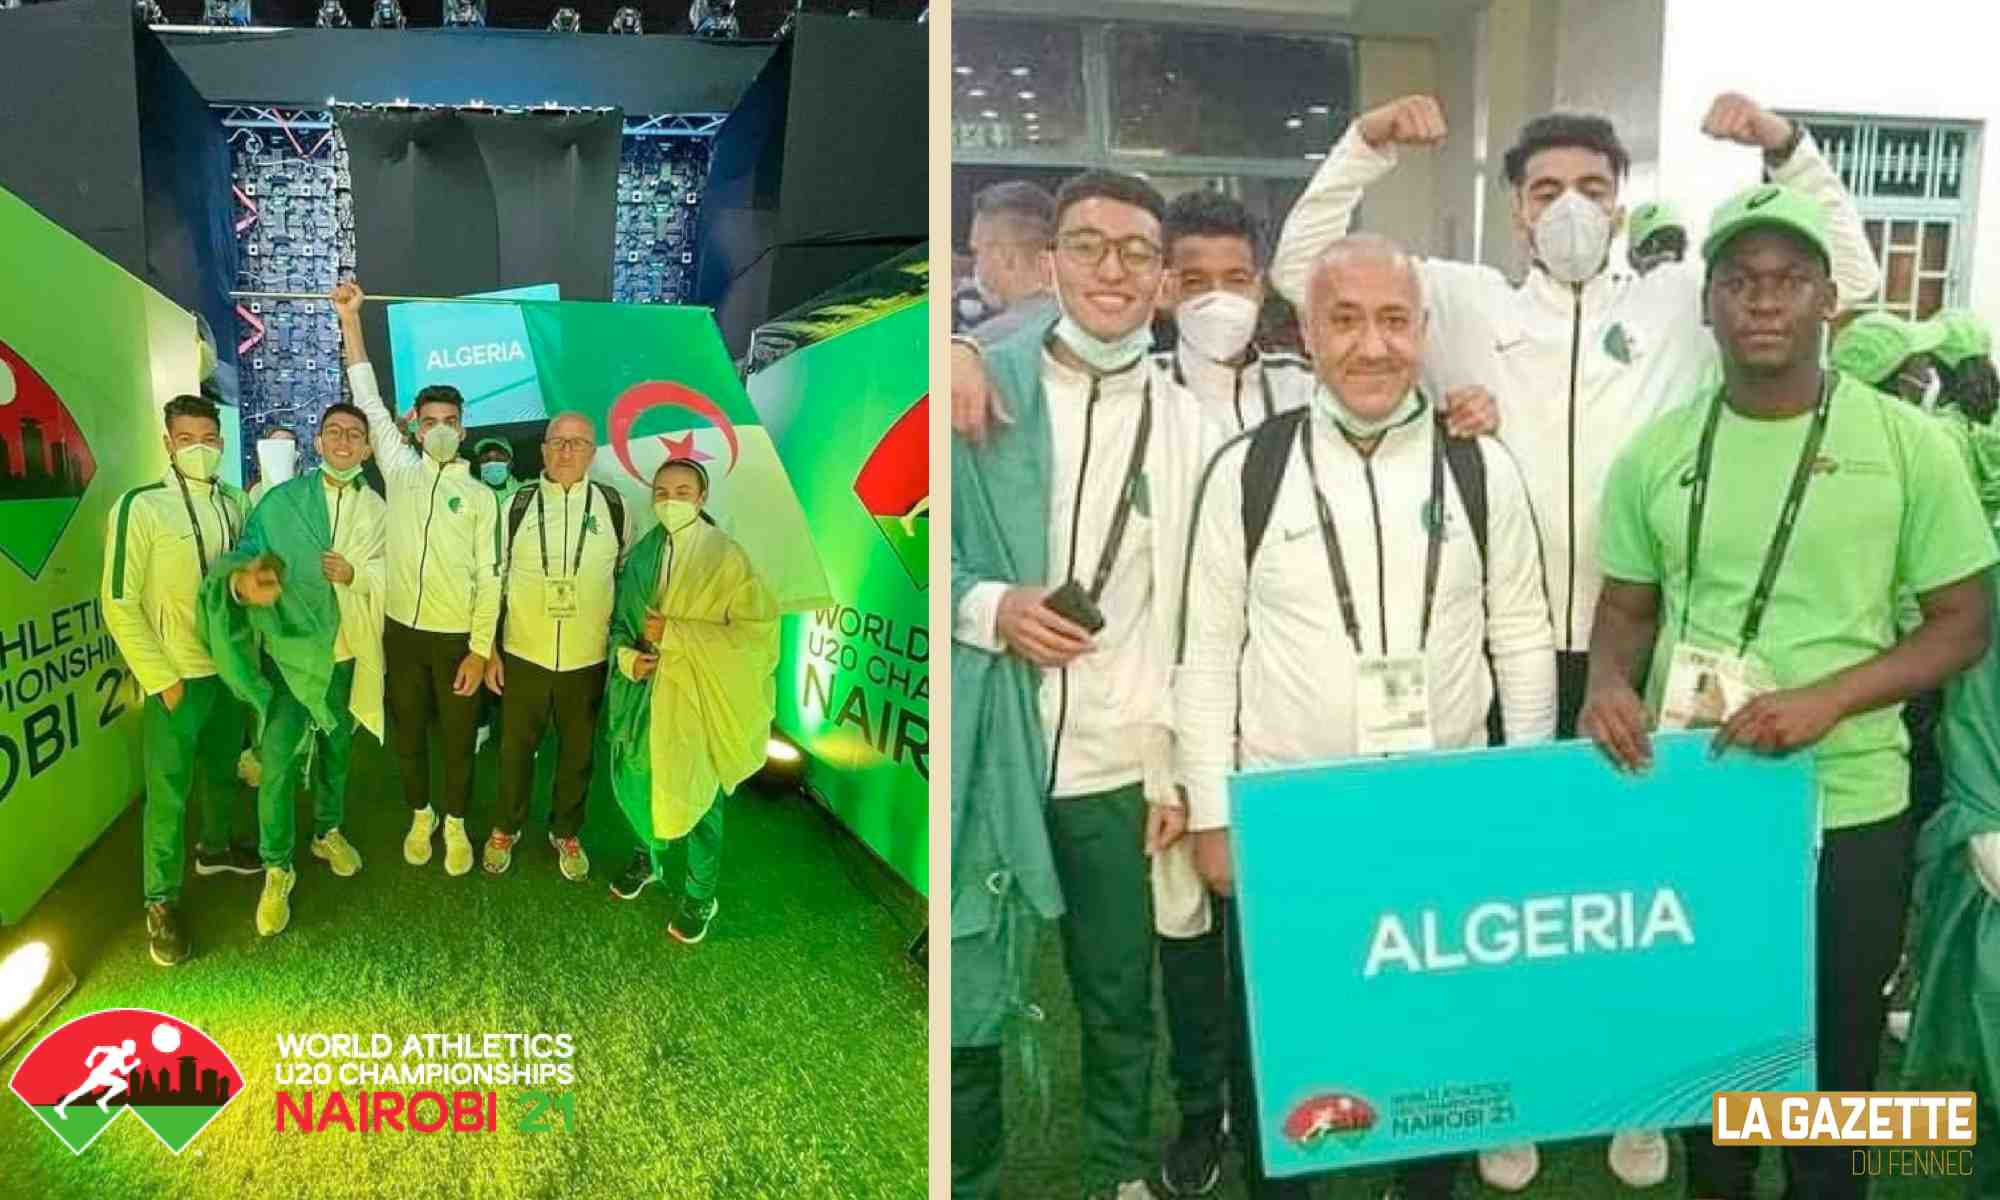 algerie gouaned nairobi 2021 athletics u20 tunnel